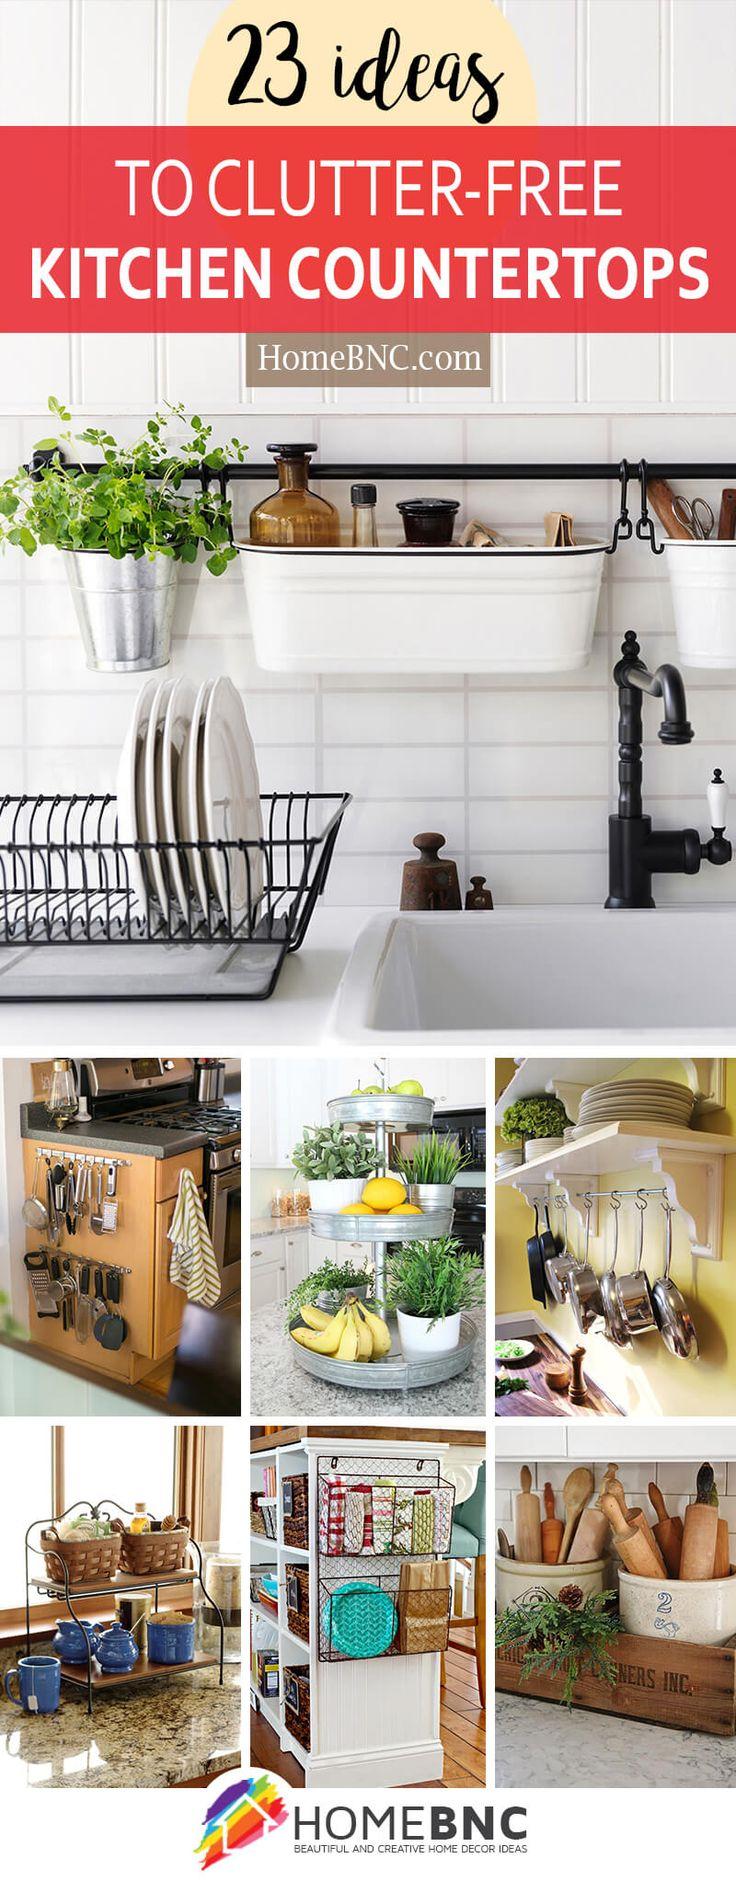 Clutter-Free Kitchen Countertop Decor Ideas